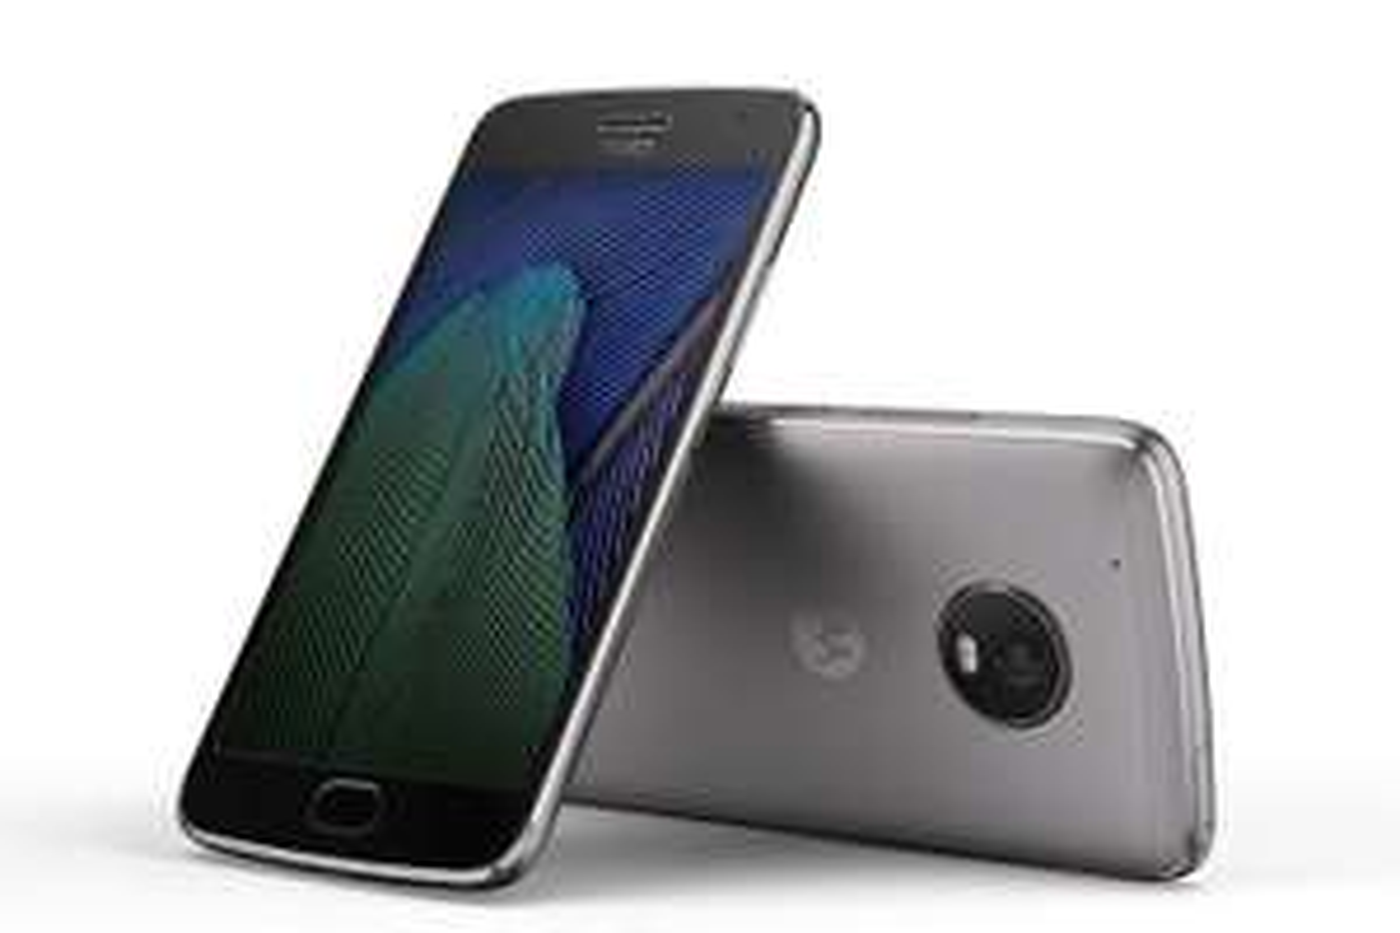 Motorola Moto G5 - £119 @ GiffGaff (£94 with cashback)